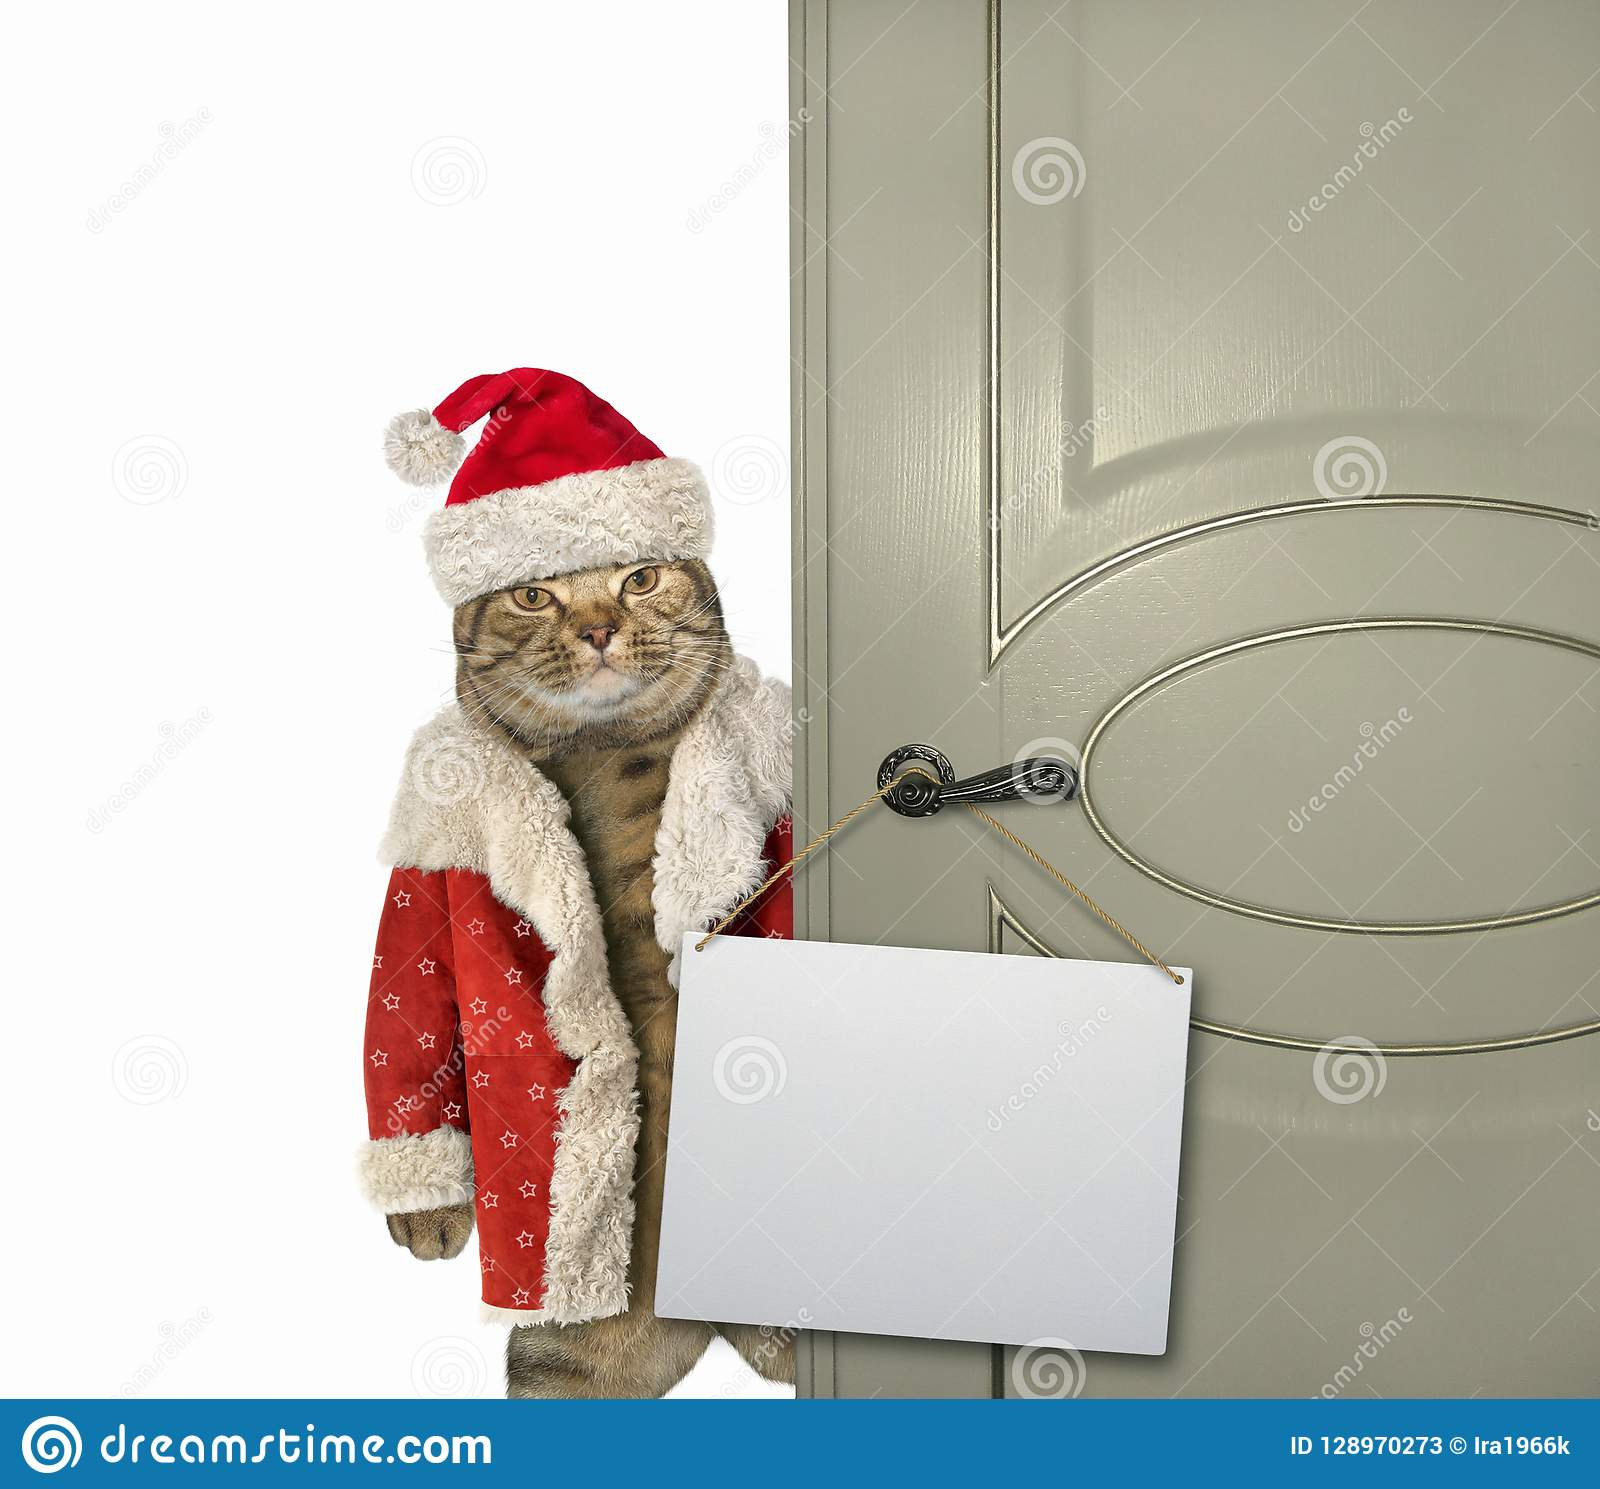 Cat Santa Claus At The Door Stock Image - Image of door, santa ...